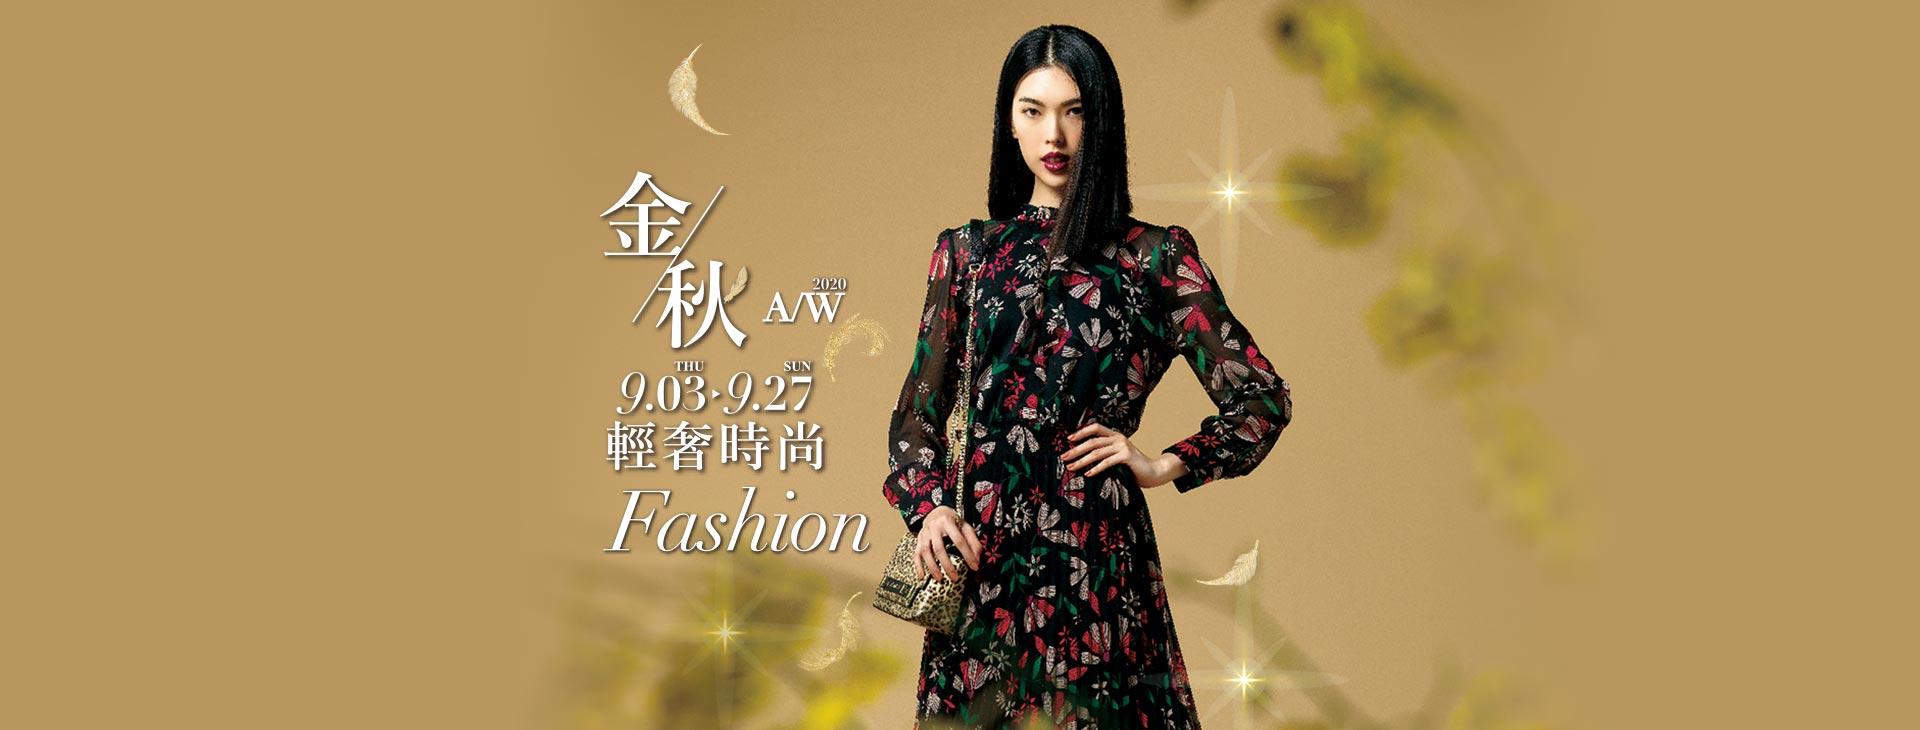 2020 A/W Fashion 金秋 輕奢時尚